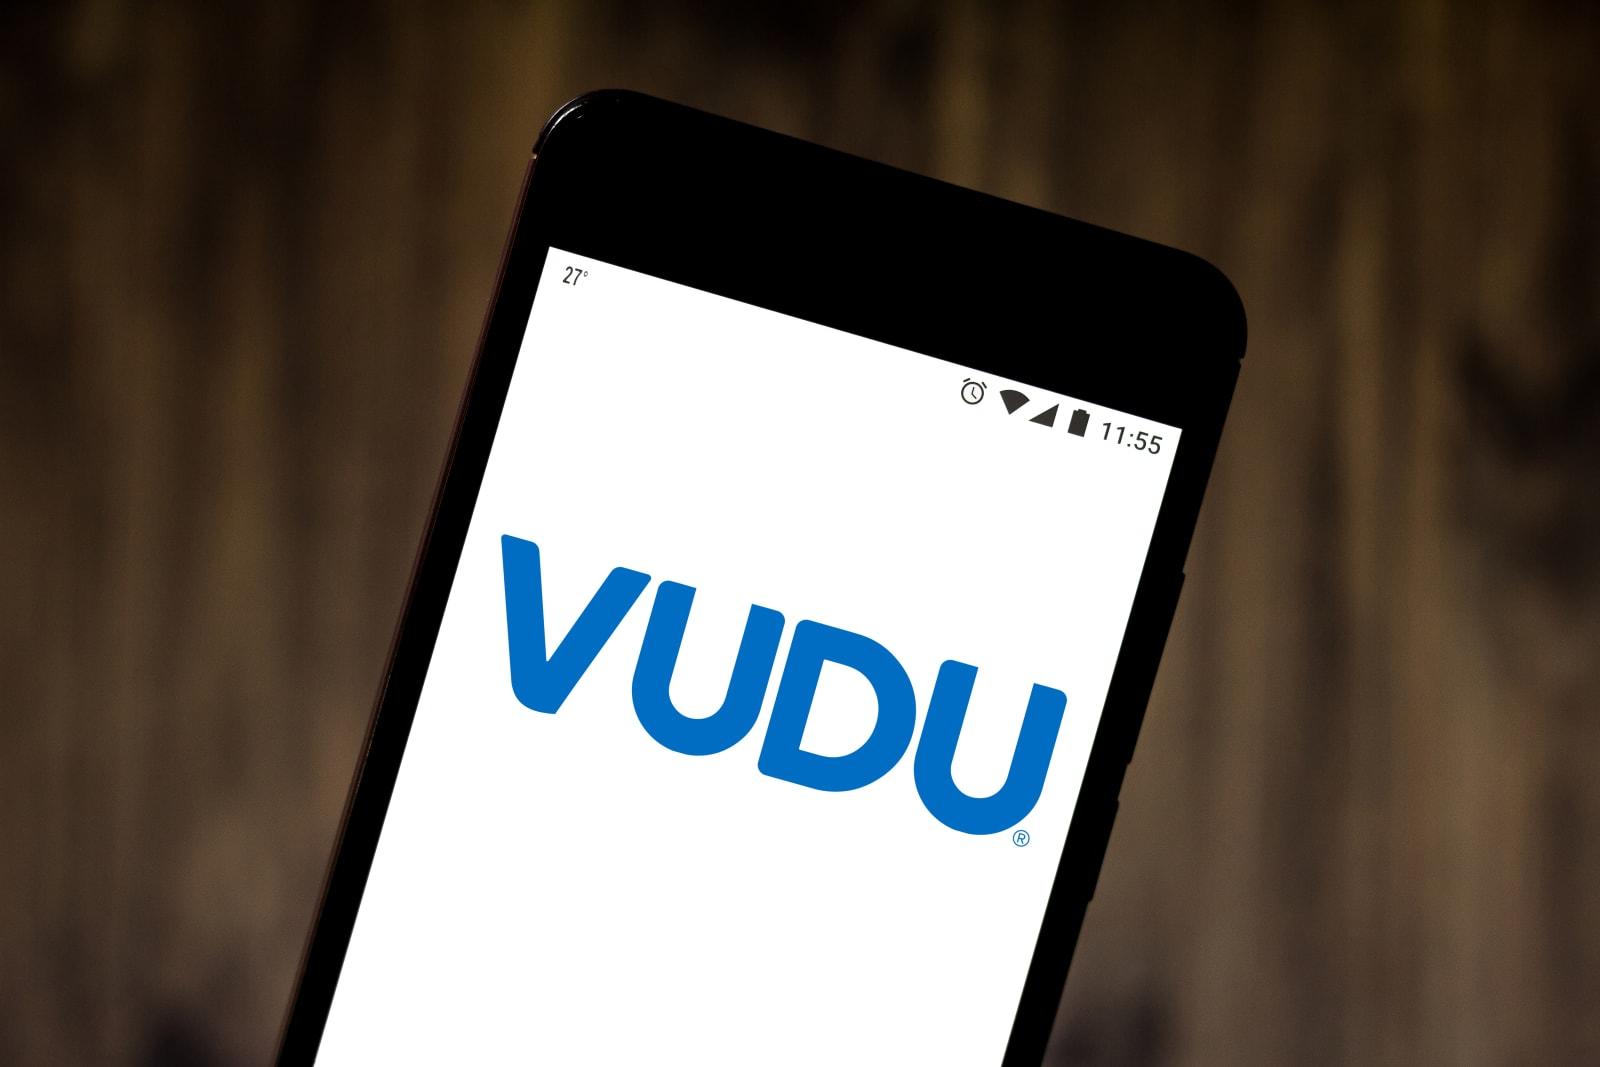 Vudu adds parental control to skip adult scenes